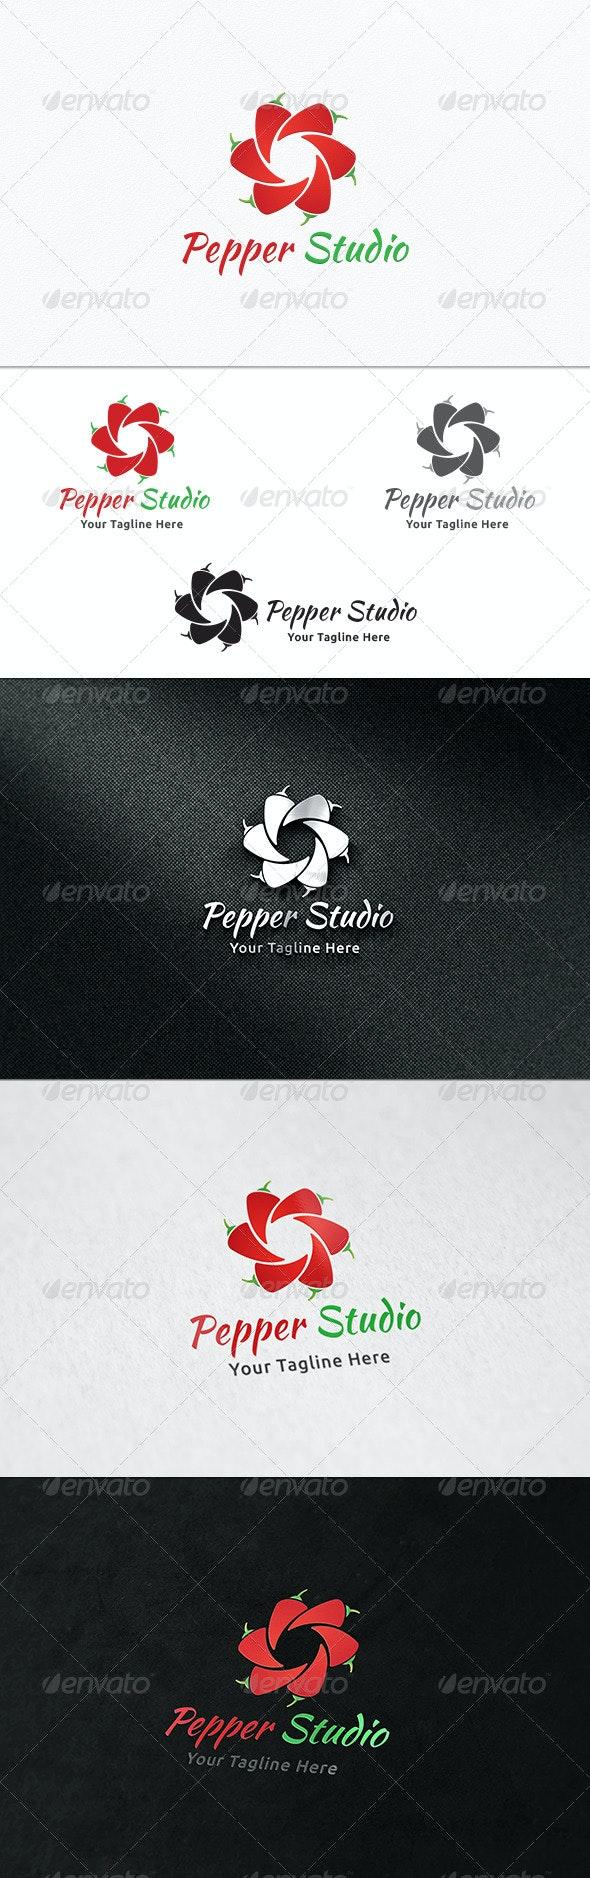 Pepper Studio - Logo Template - Nature Logo Templates